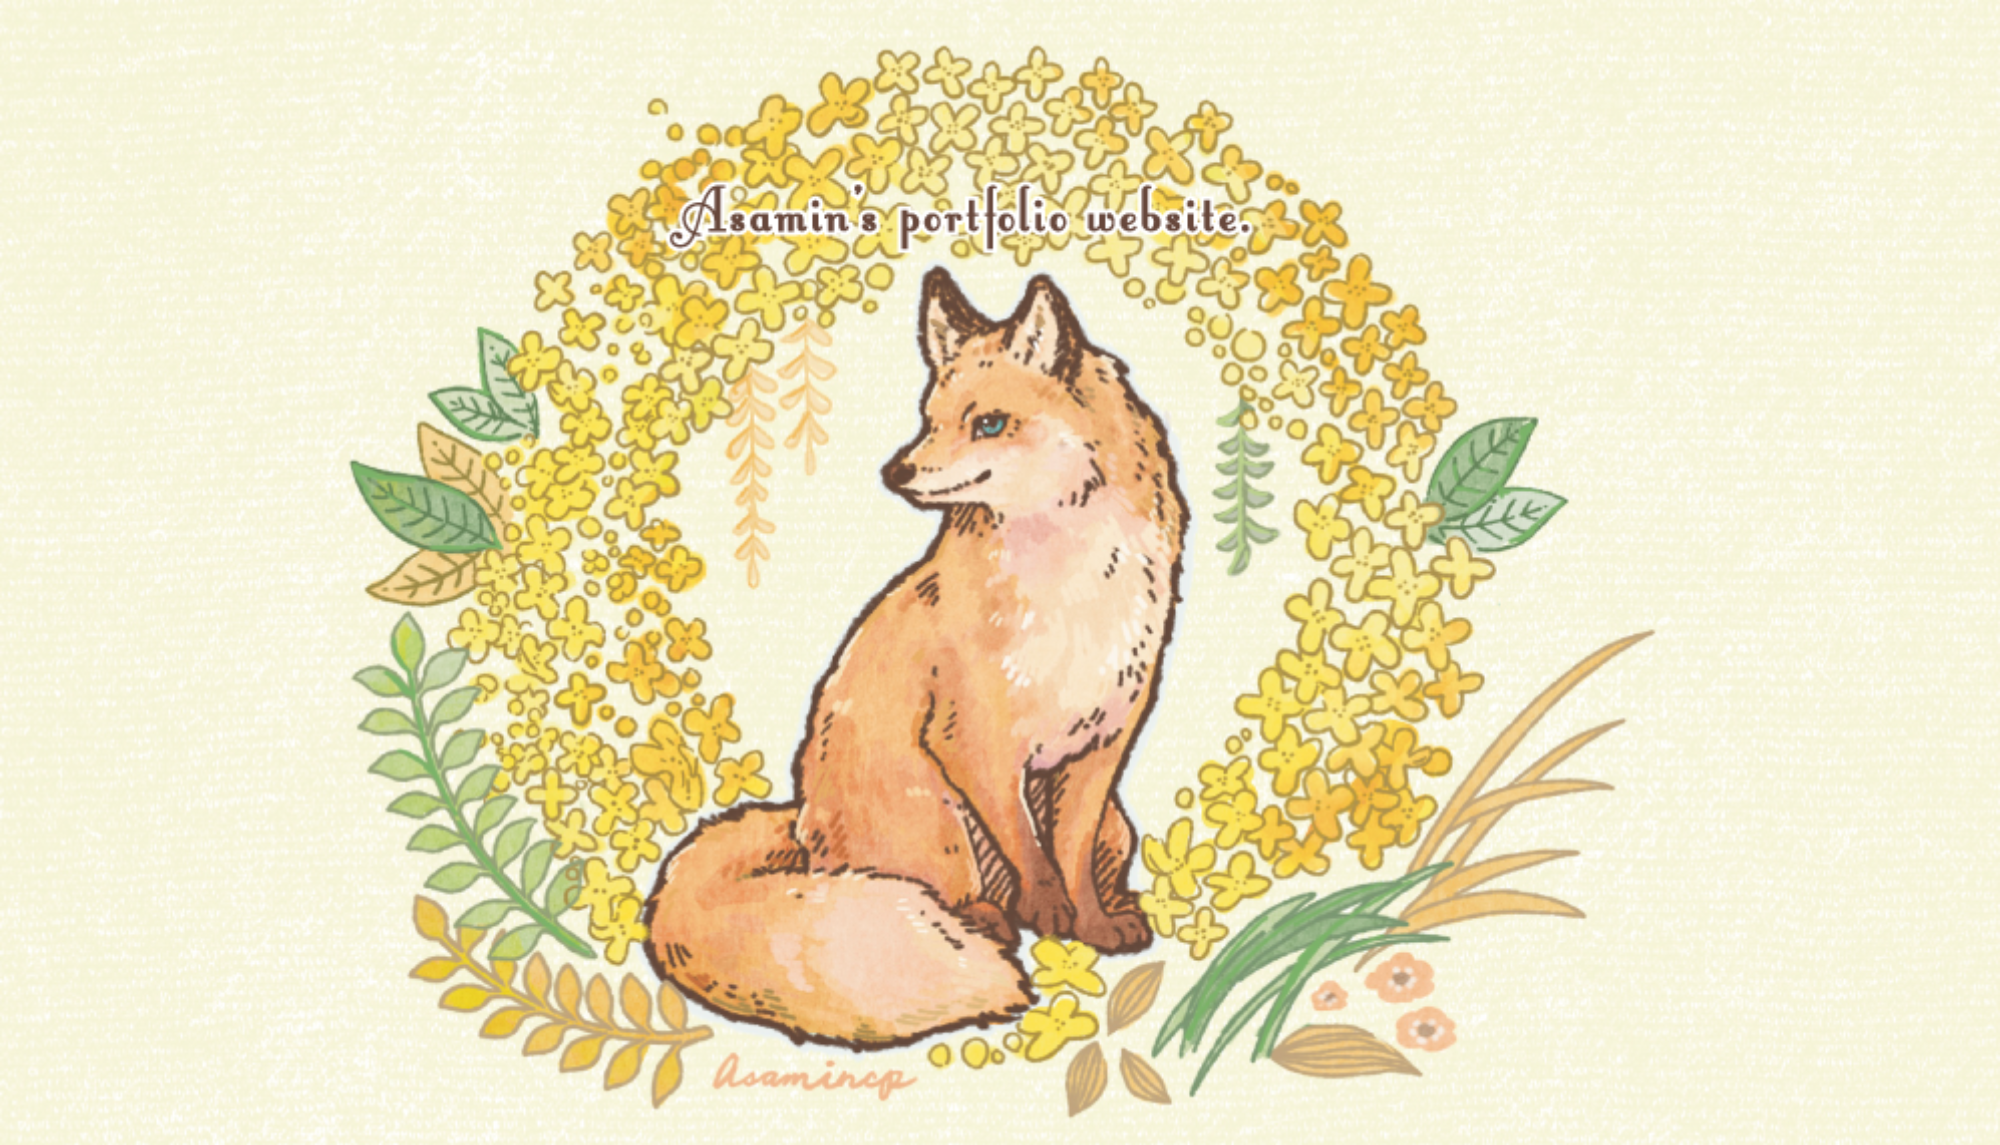 IshiiAsami Artworks | 石井愛紗美のポートフォリオサイト.